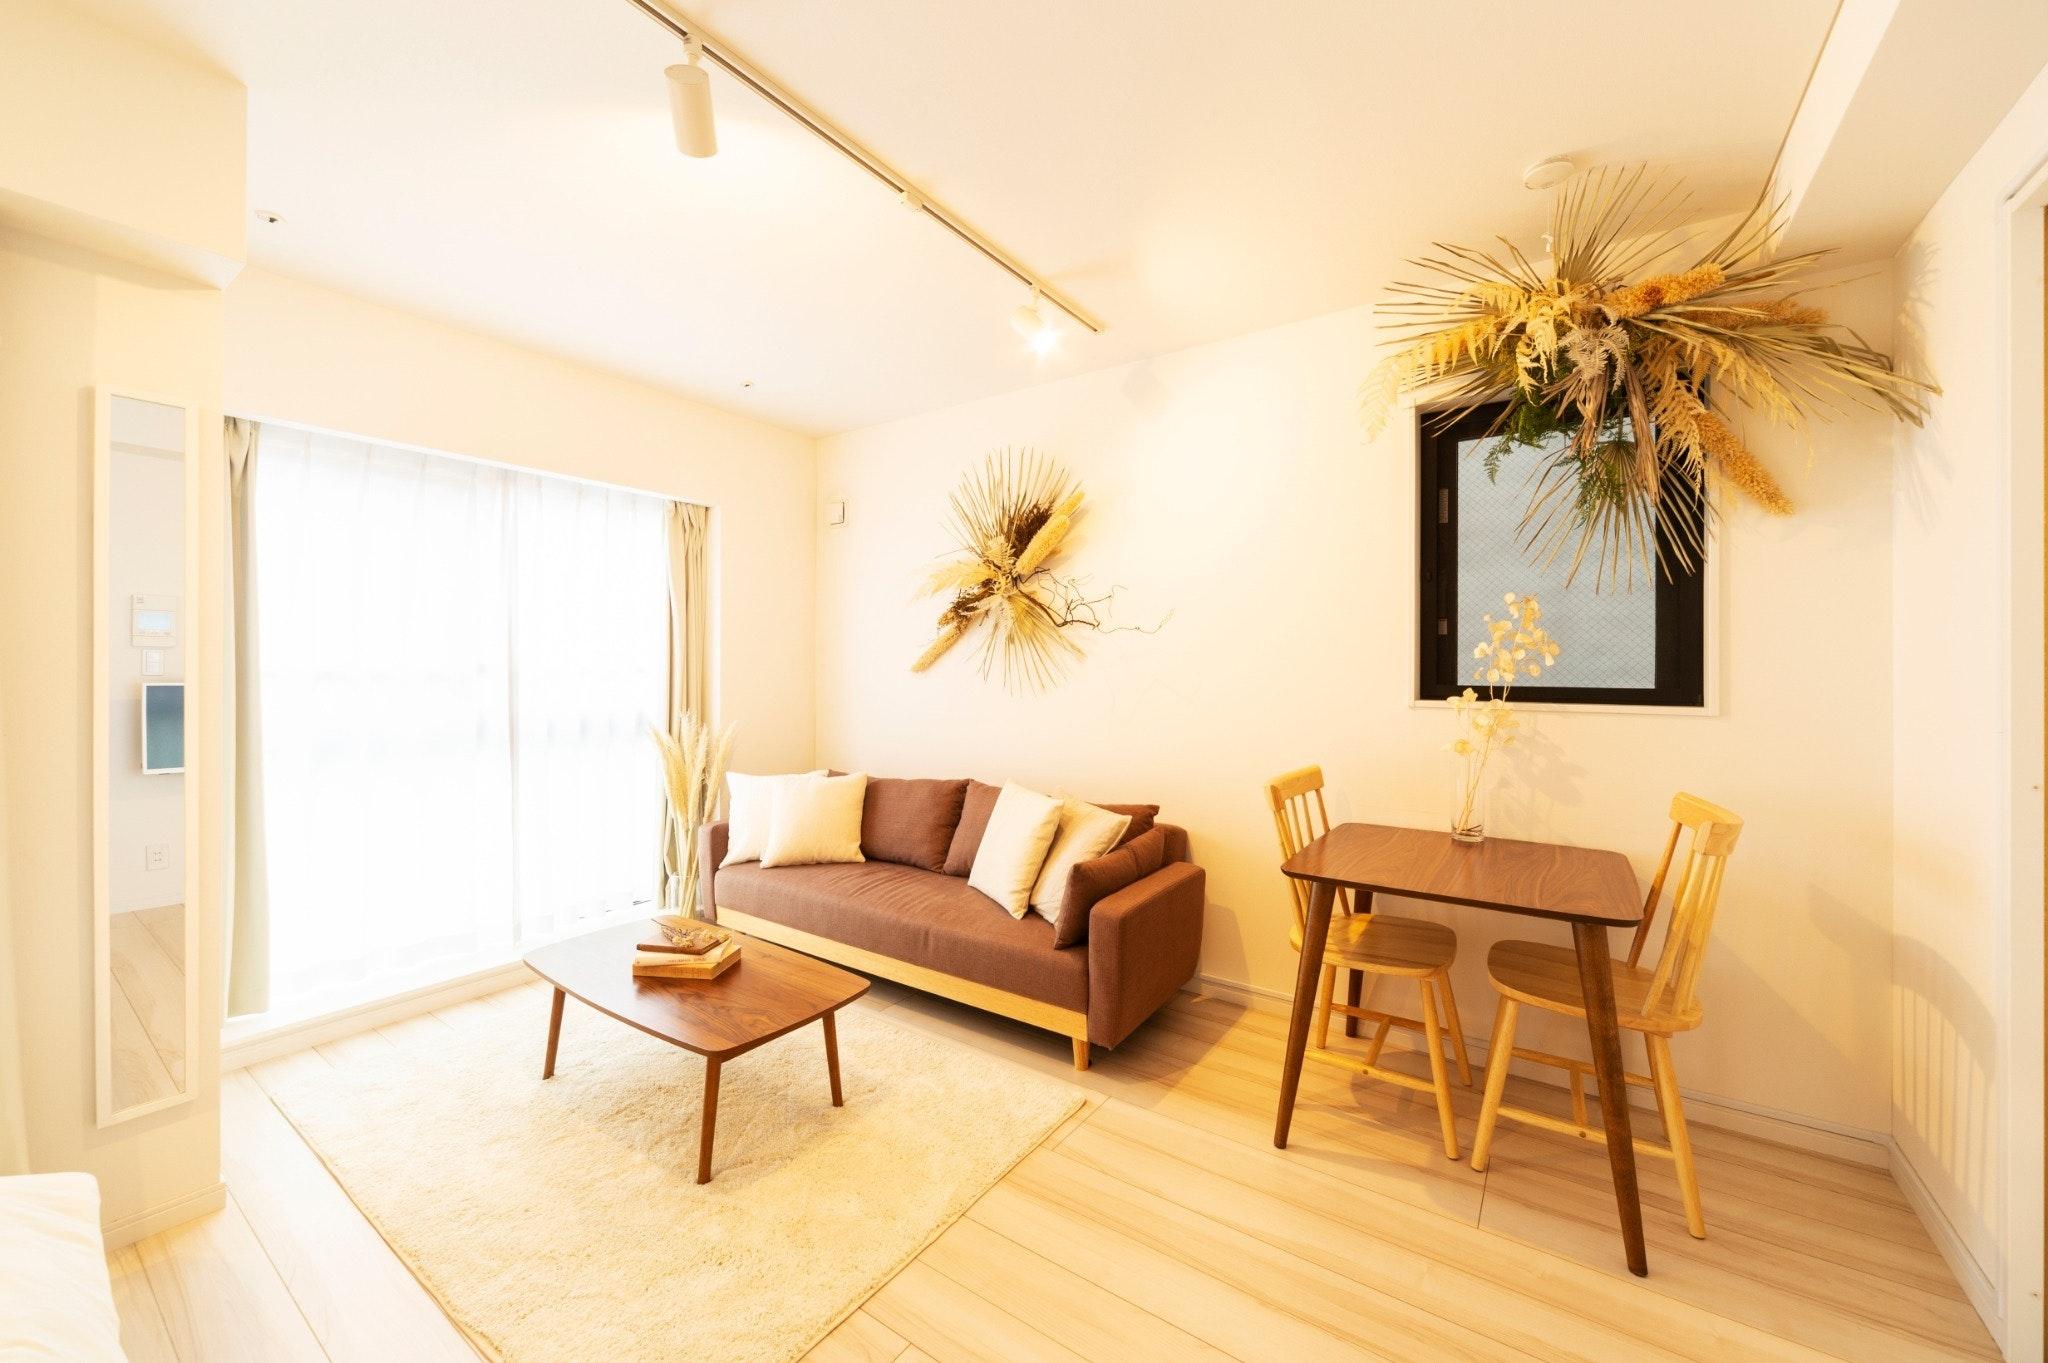 GH201*東中野駅、落合駅徒歩4分、キッチン、洗濯機付きの30平米1Kの住居型ホテル